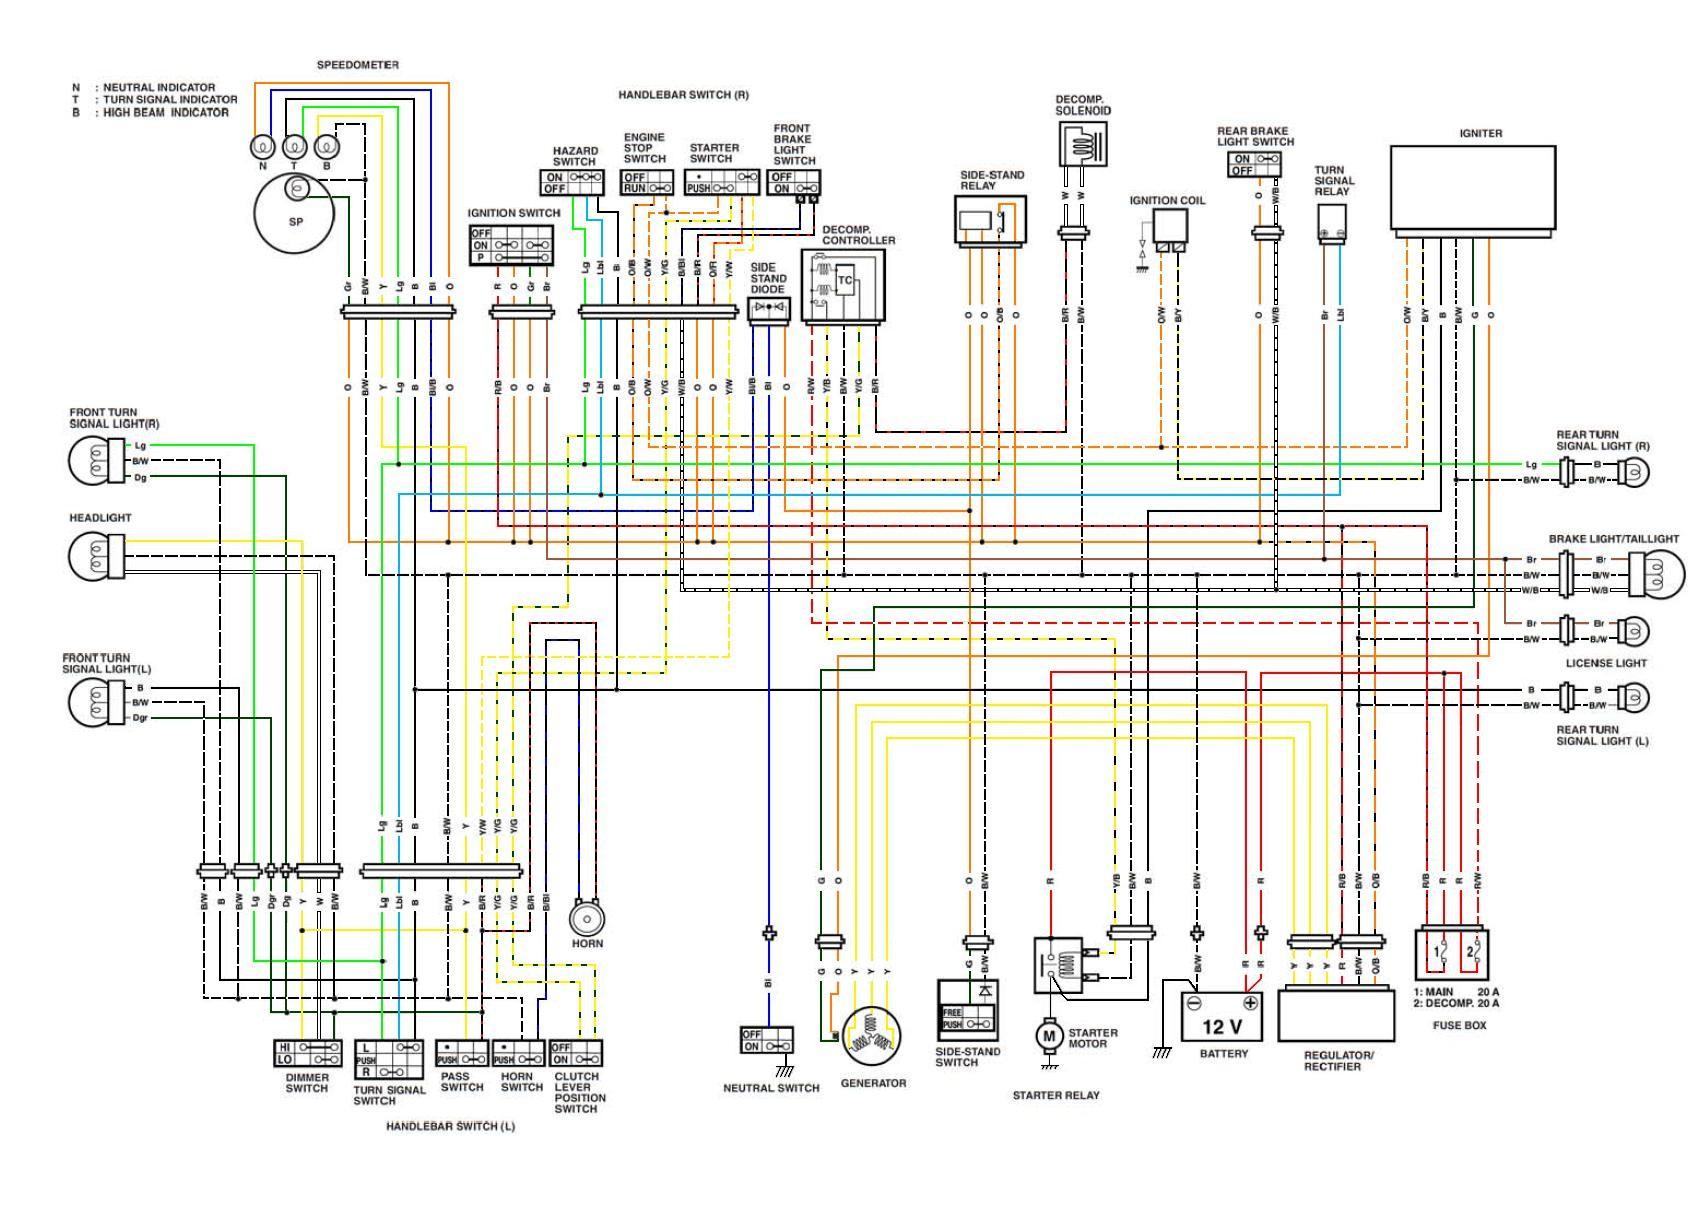 Harley Fl Wiring Diagram - machine learning on